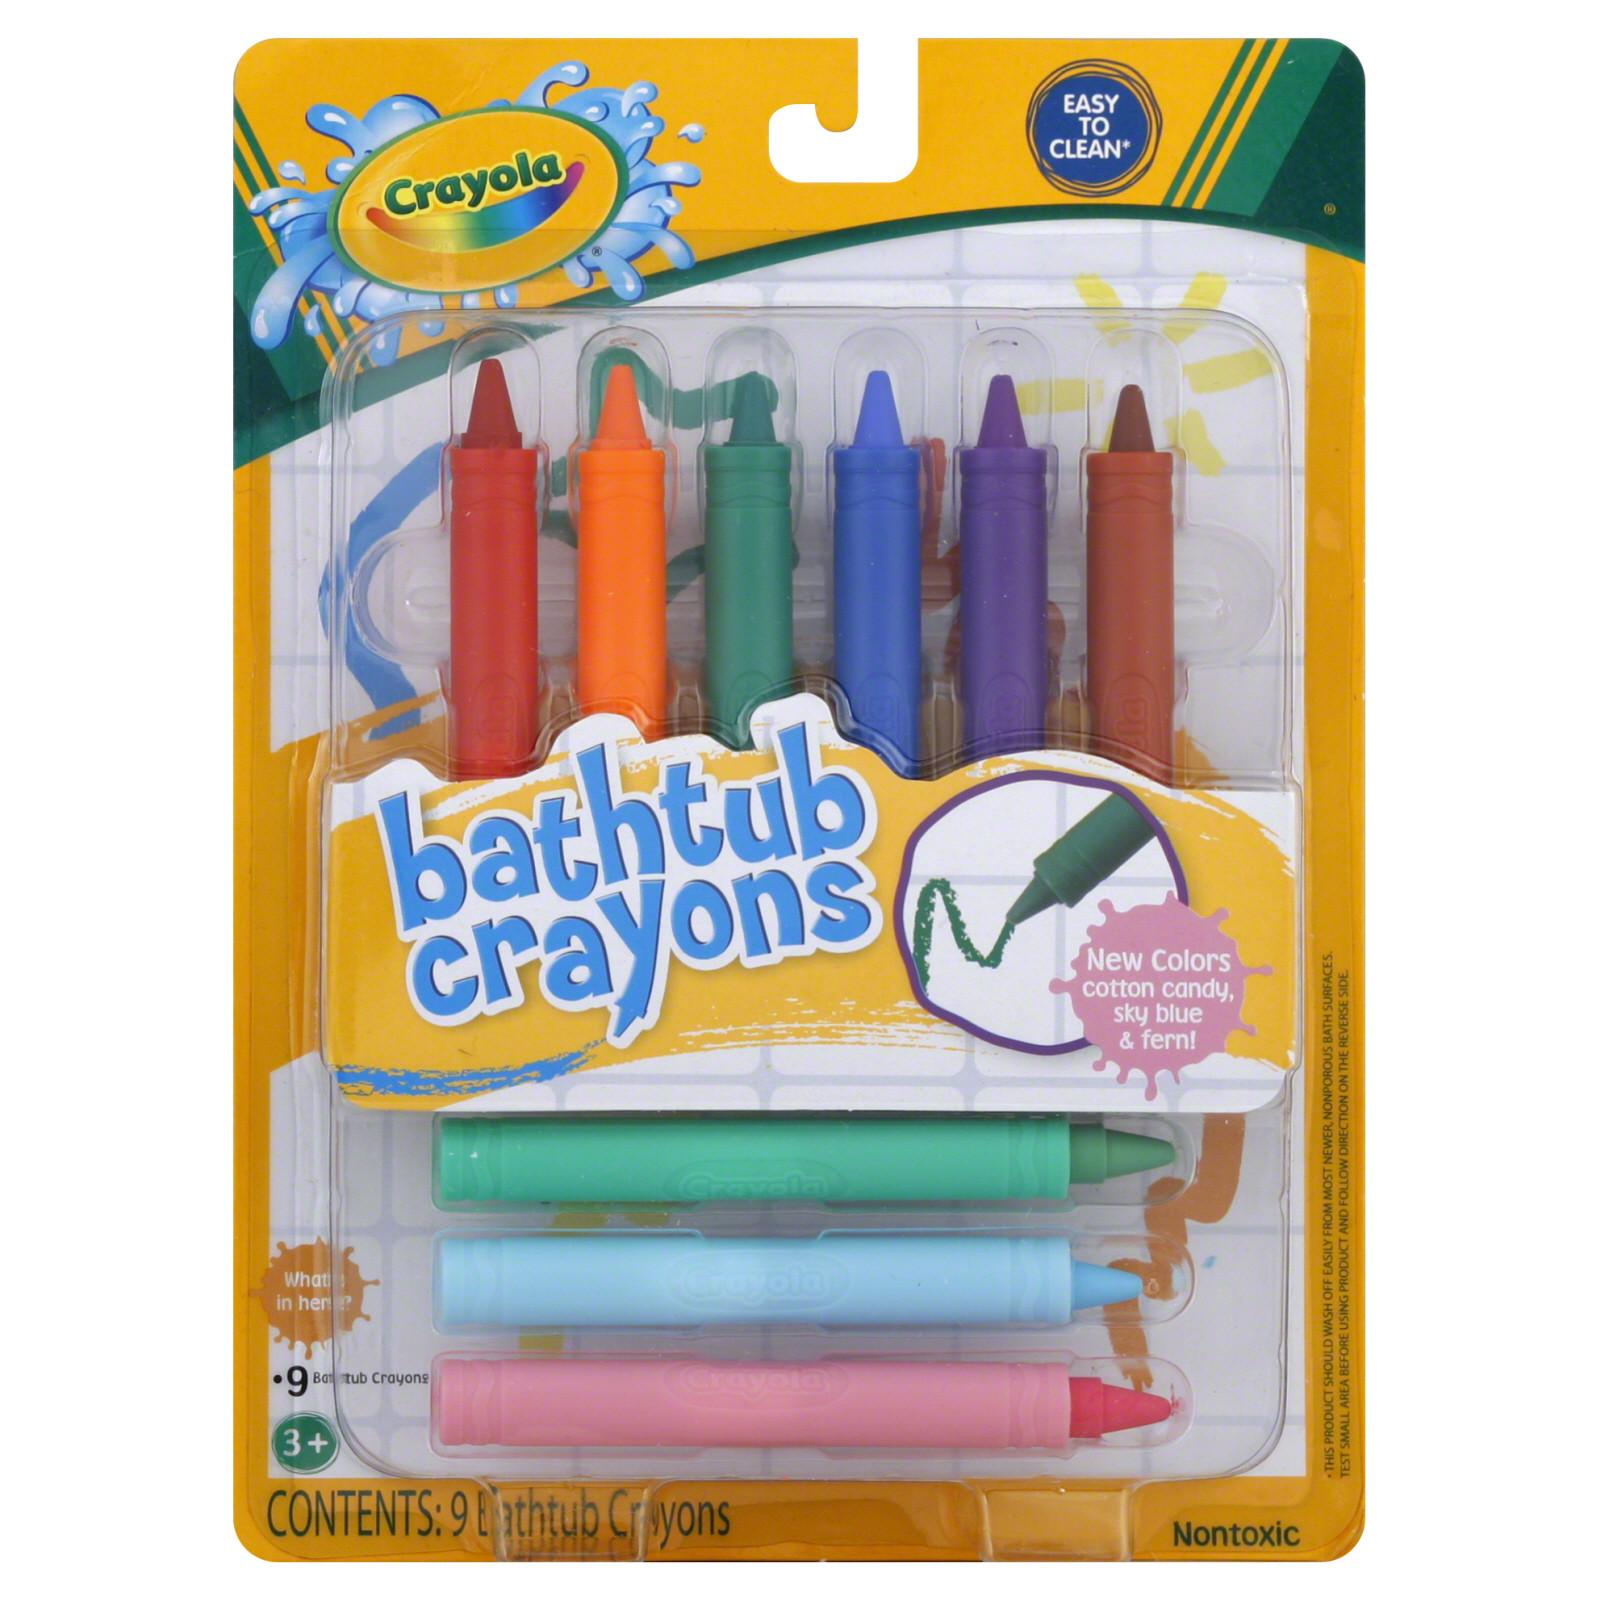 Best ideas about Crayola Bathroom Crayons . Save or Pin Crayola Bathtub Crayons 9 crayons Now.